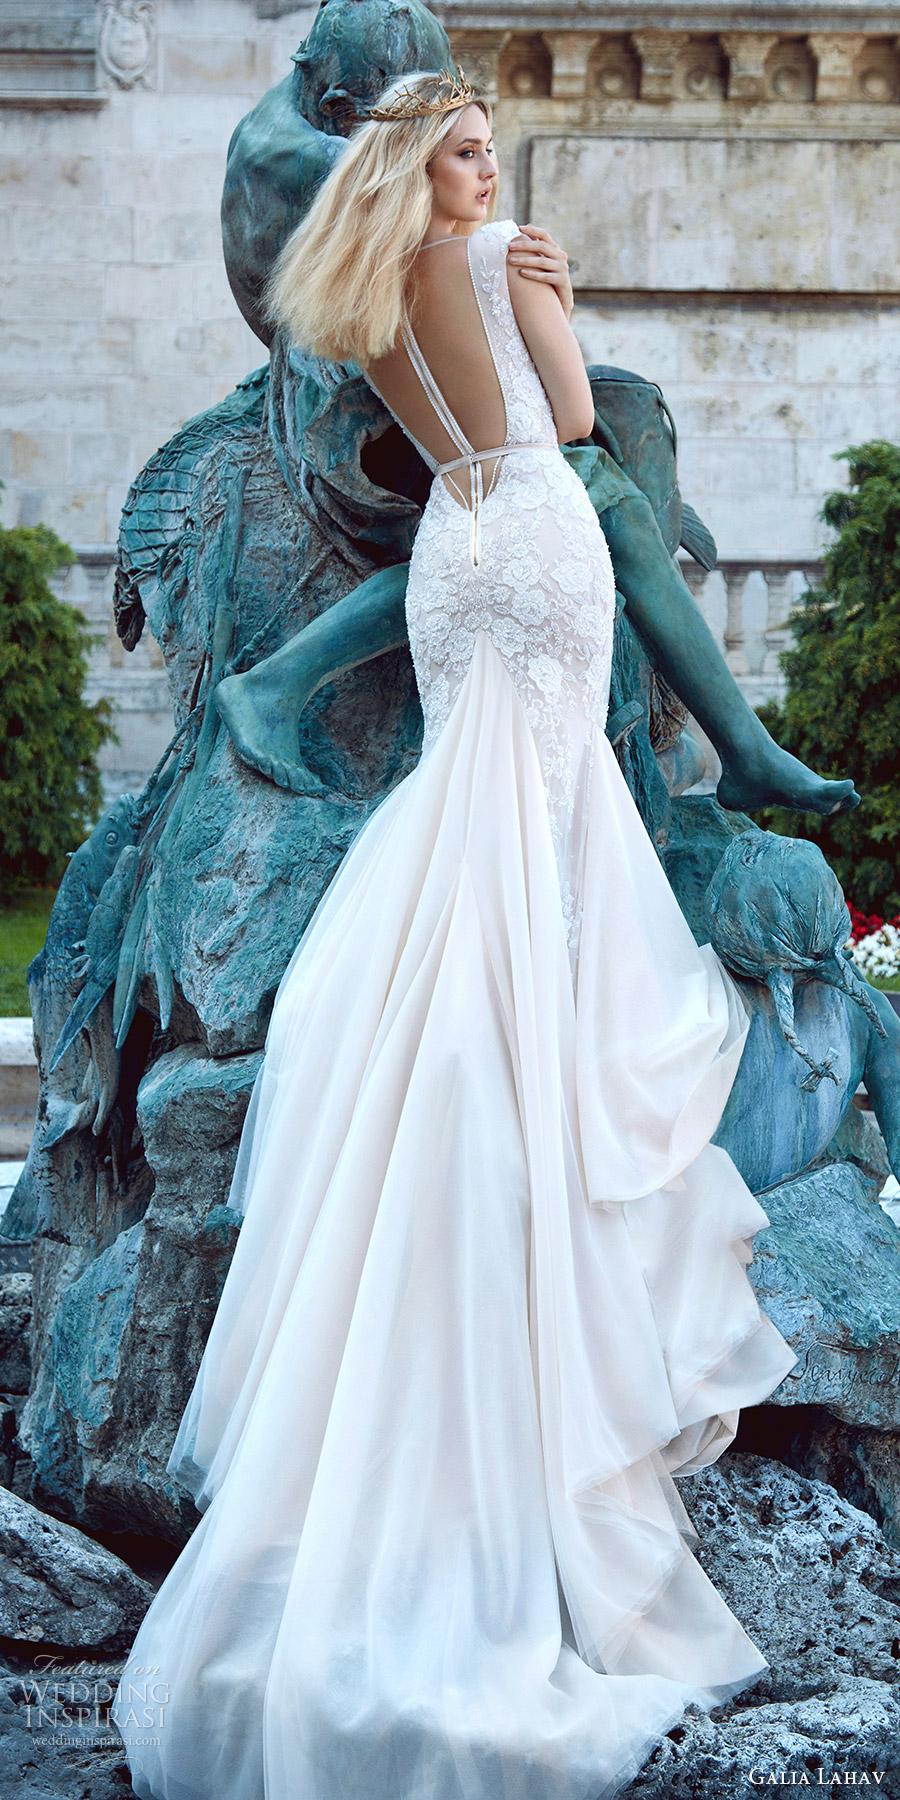 galia lahav fall 2016 bridal cap sleeves deep v neck trumpet lace wedding dress (roxanne) romantic princess bv illusion low back train